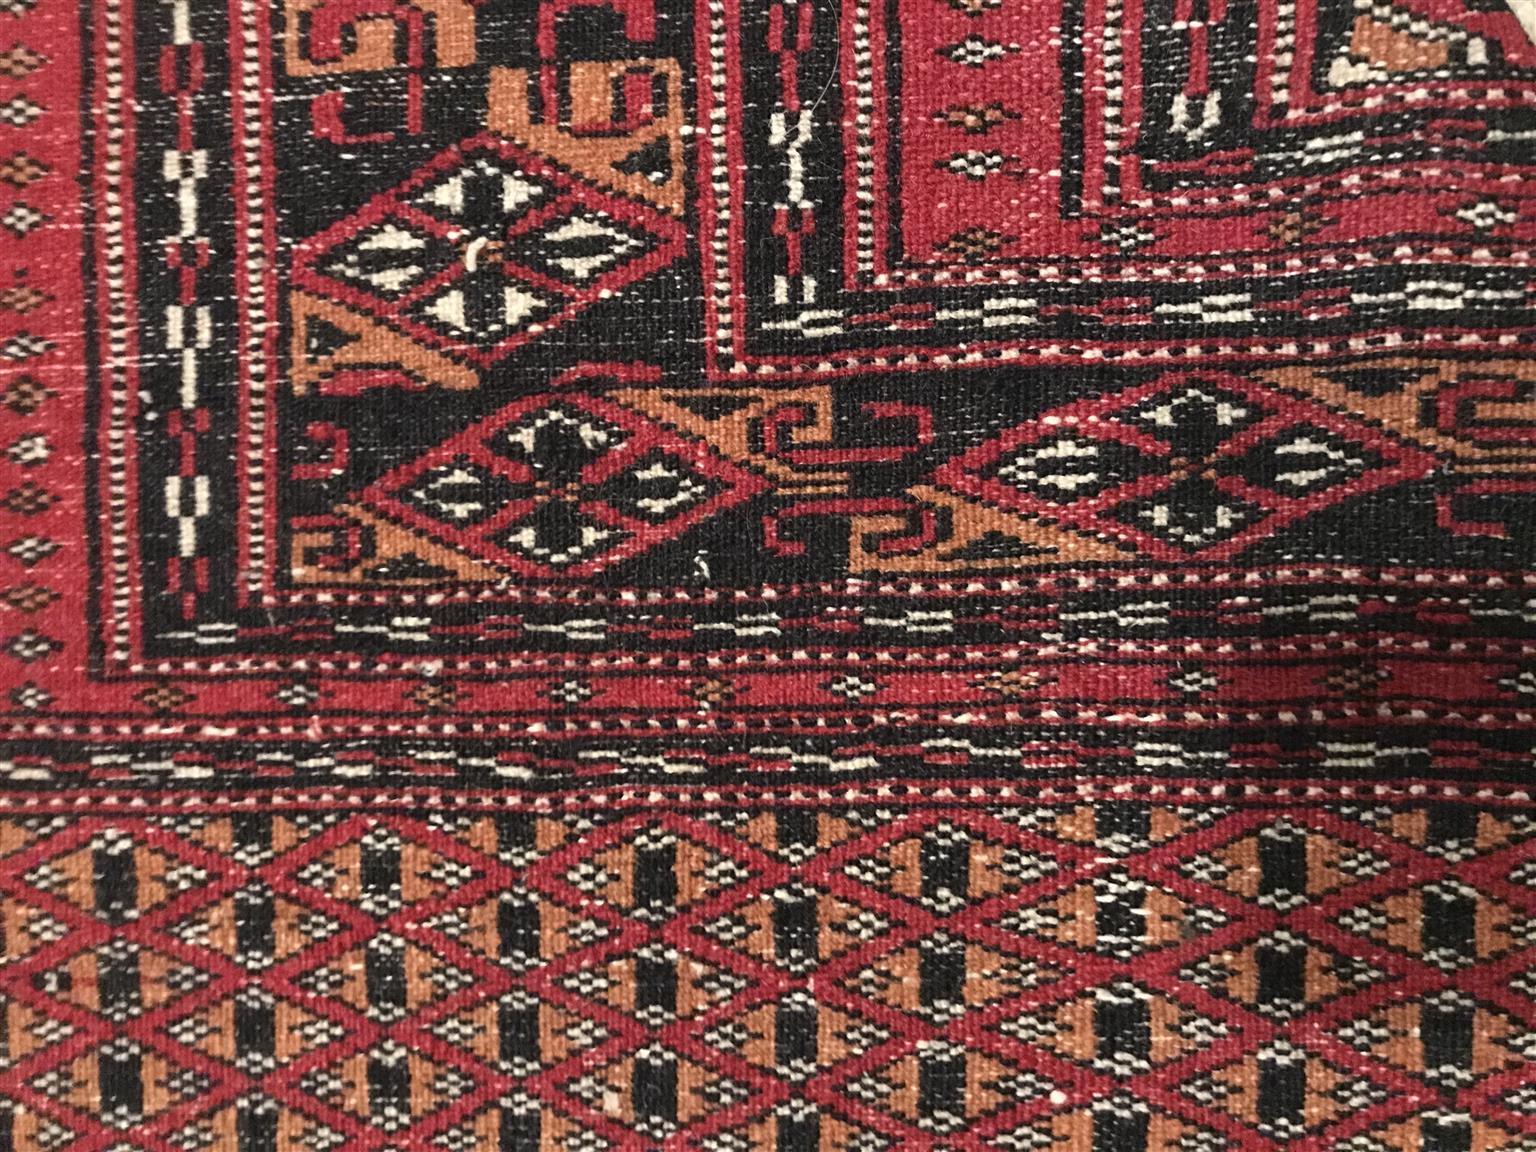 Afghan red carpet